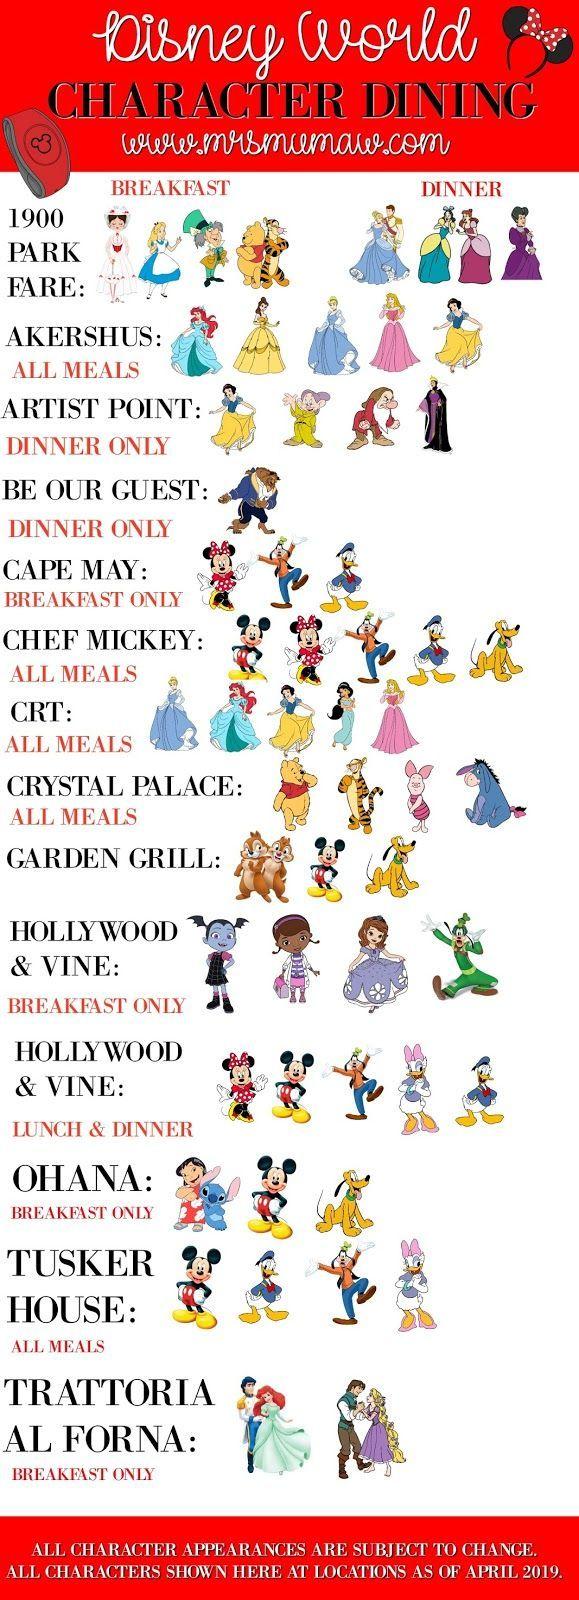 Disney World Character Dining at Glance